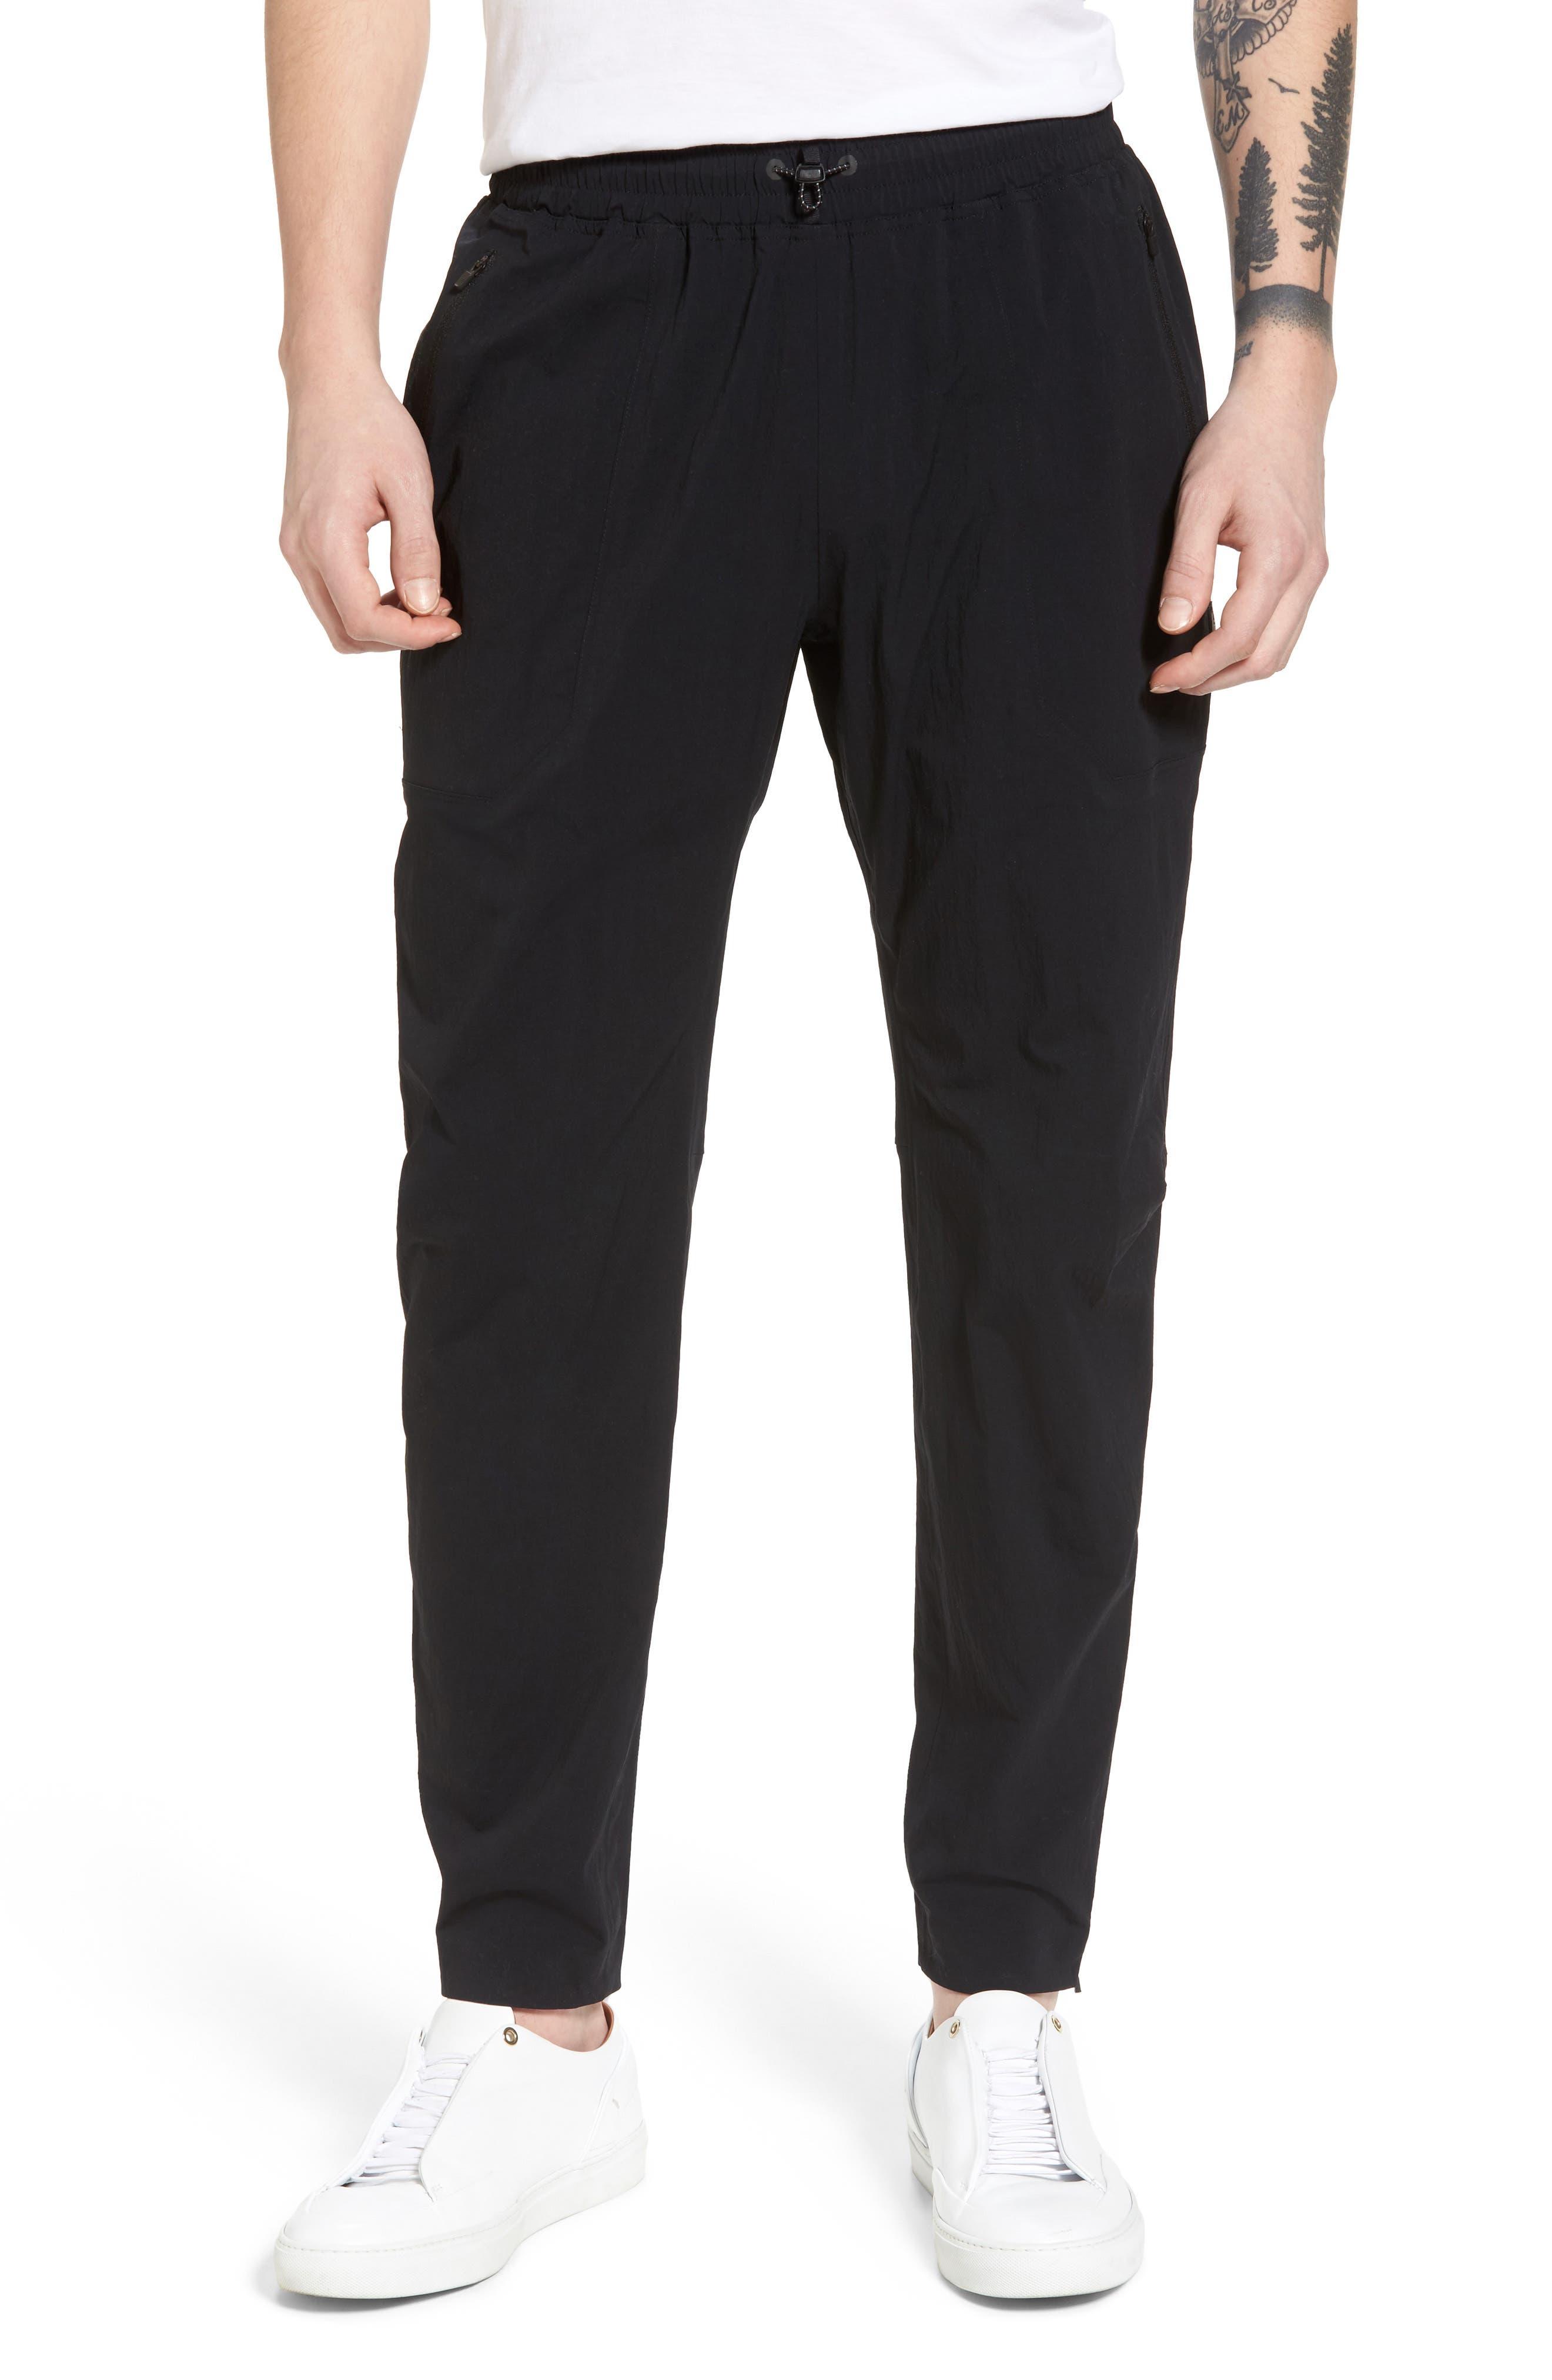 N279 Sweatpants,                             Main thumbnail 1, color,                             Black